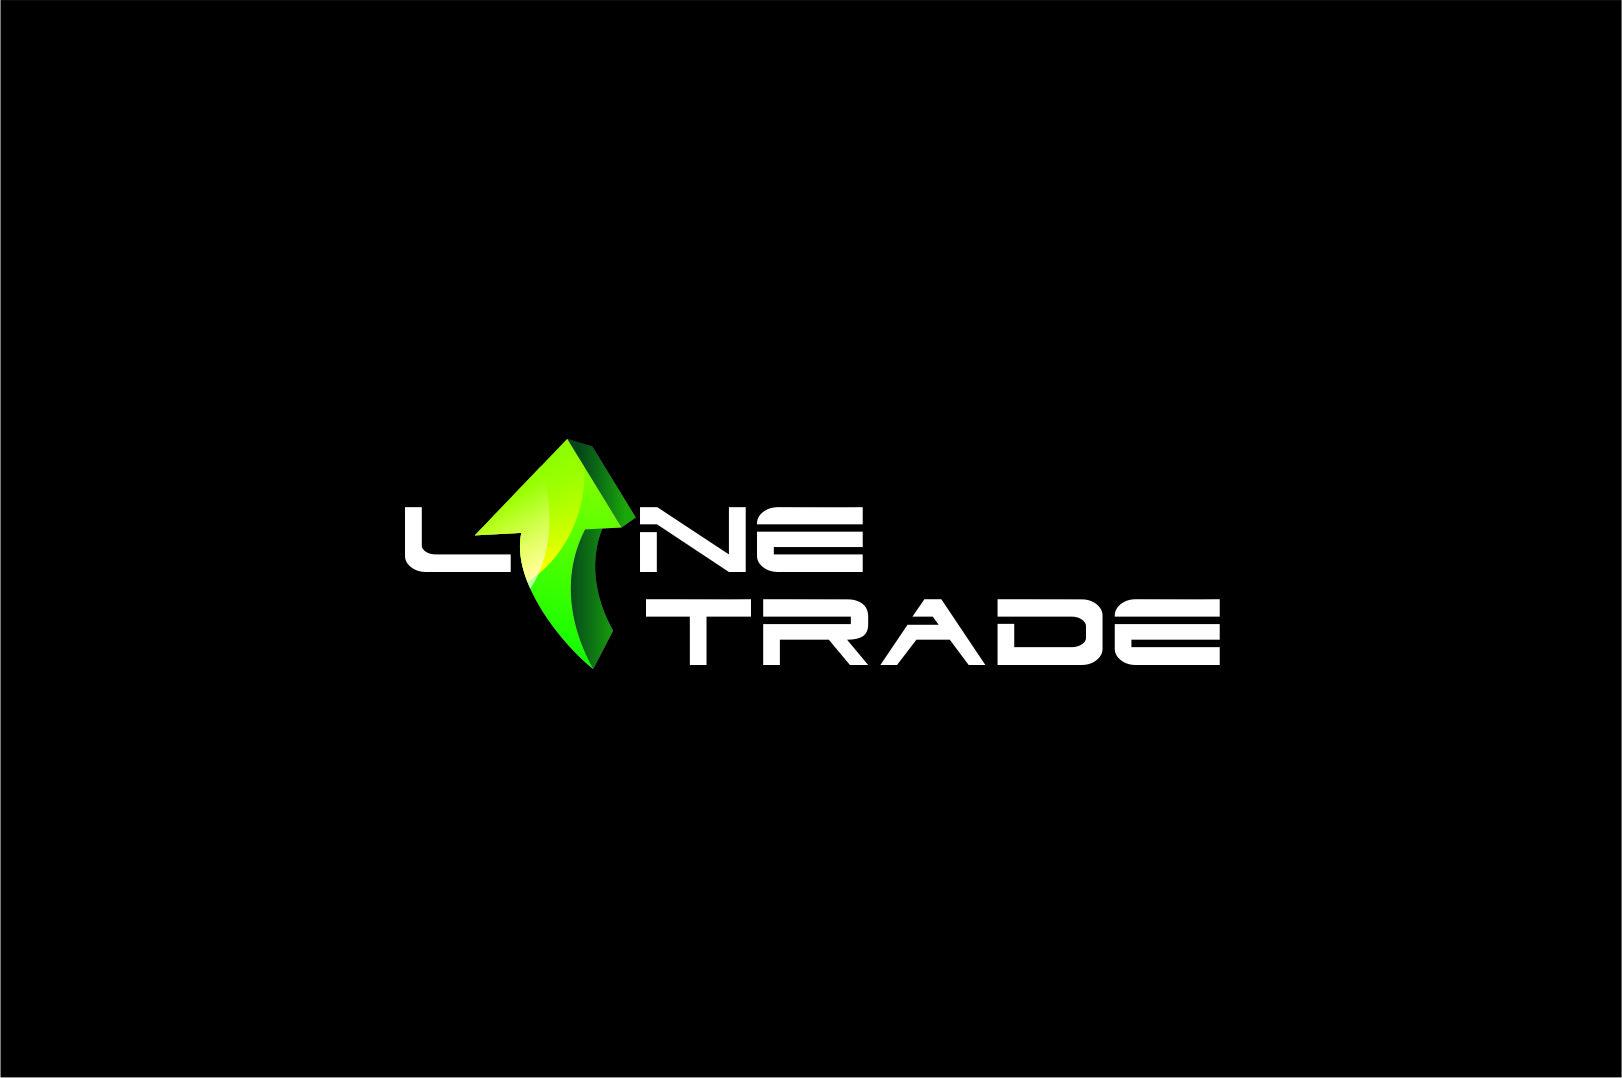 Разработка логотипа компании Line Trade фото f_41150f7a875e8de4.jpg